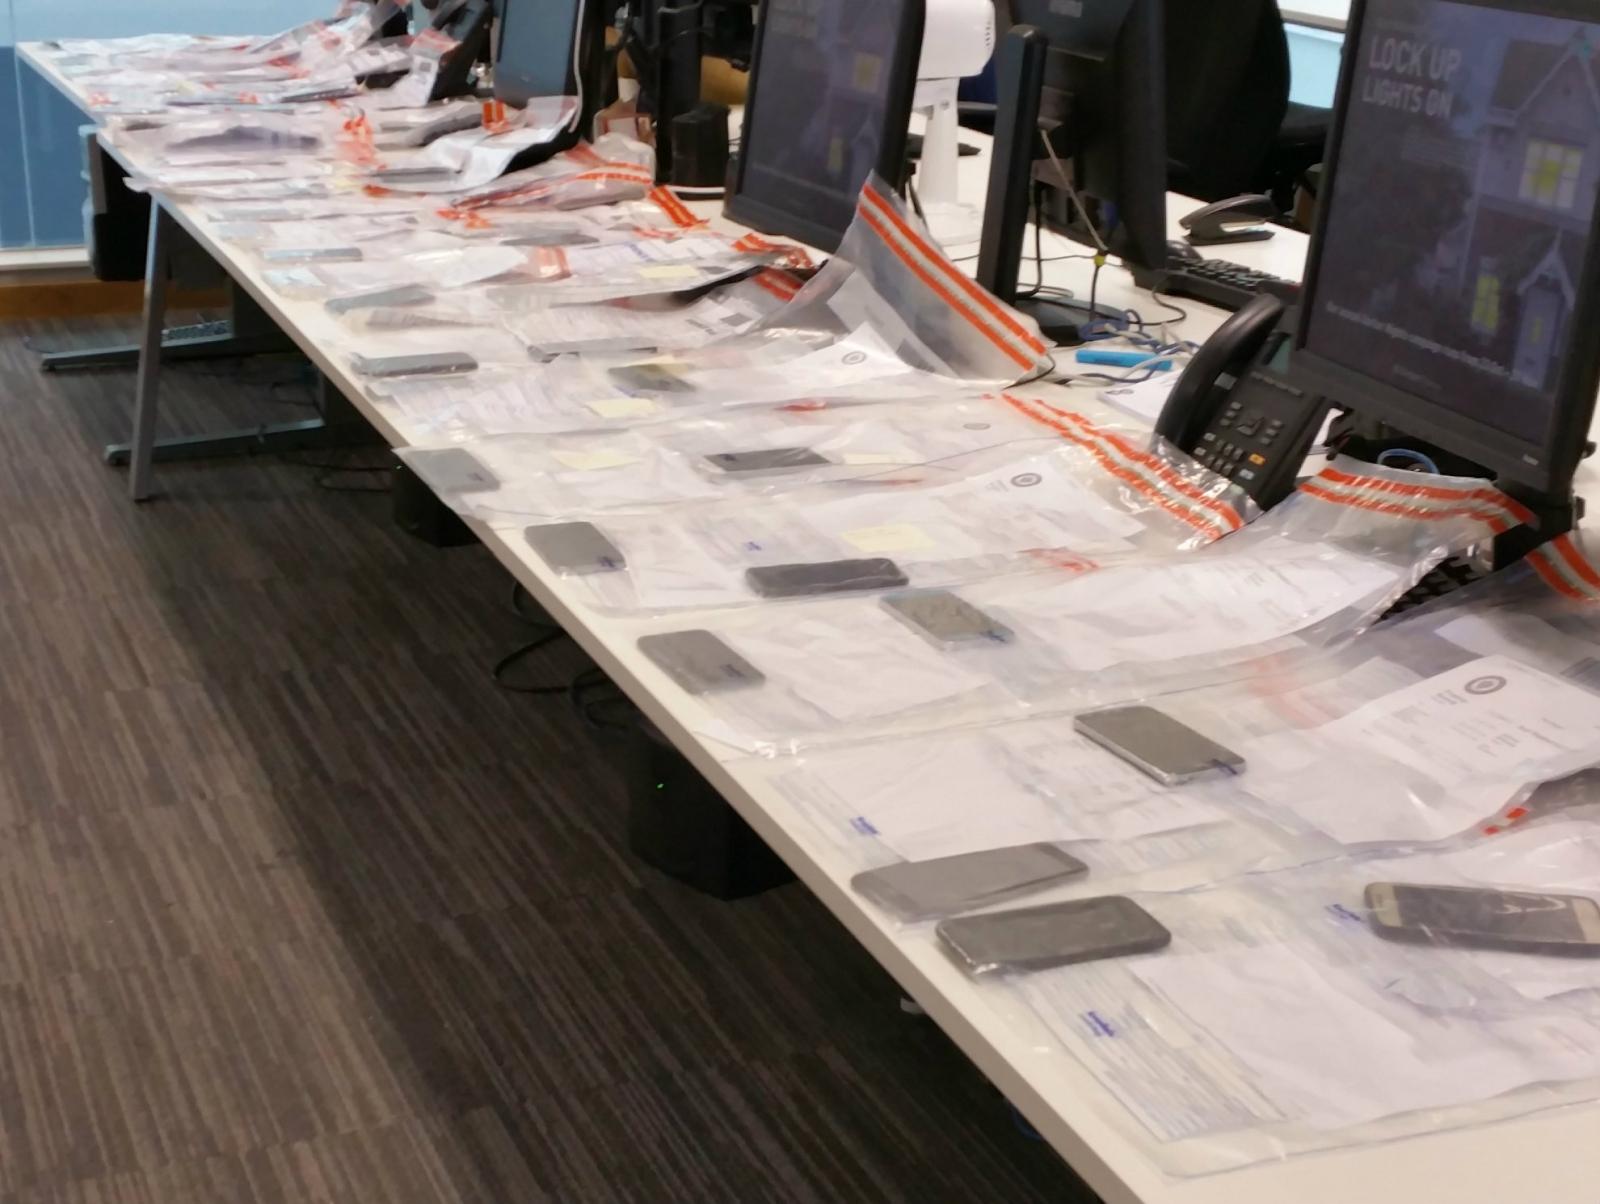 Suspect caught with 53 phones